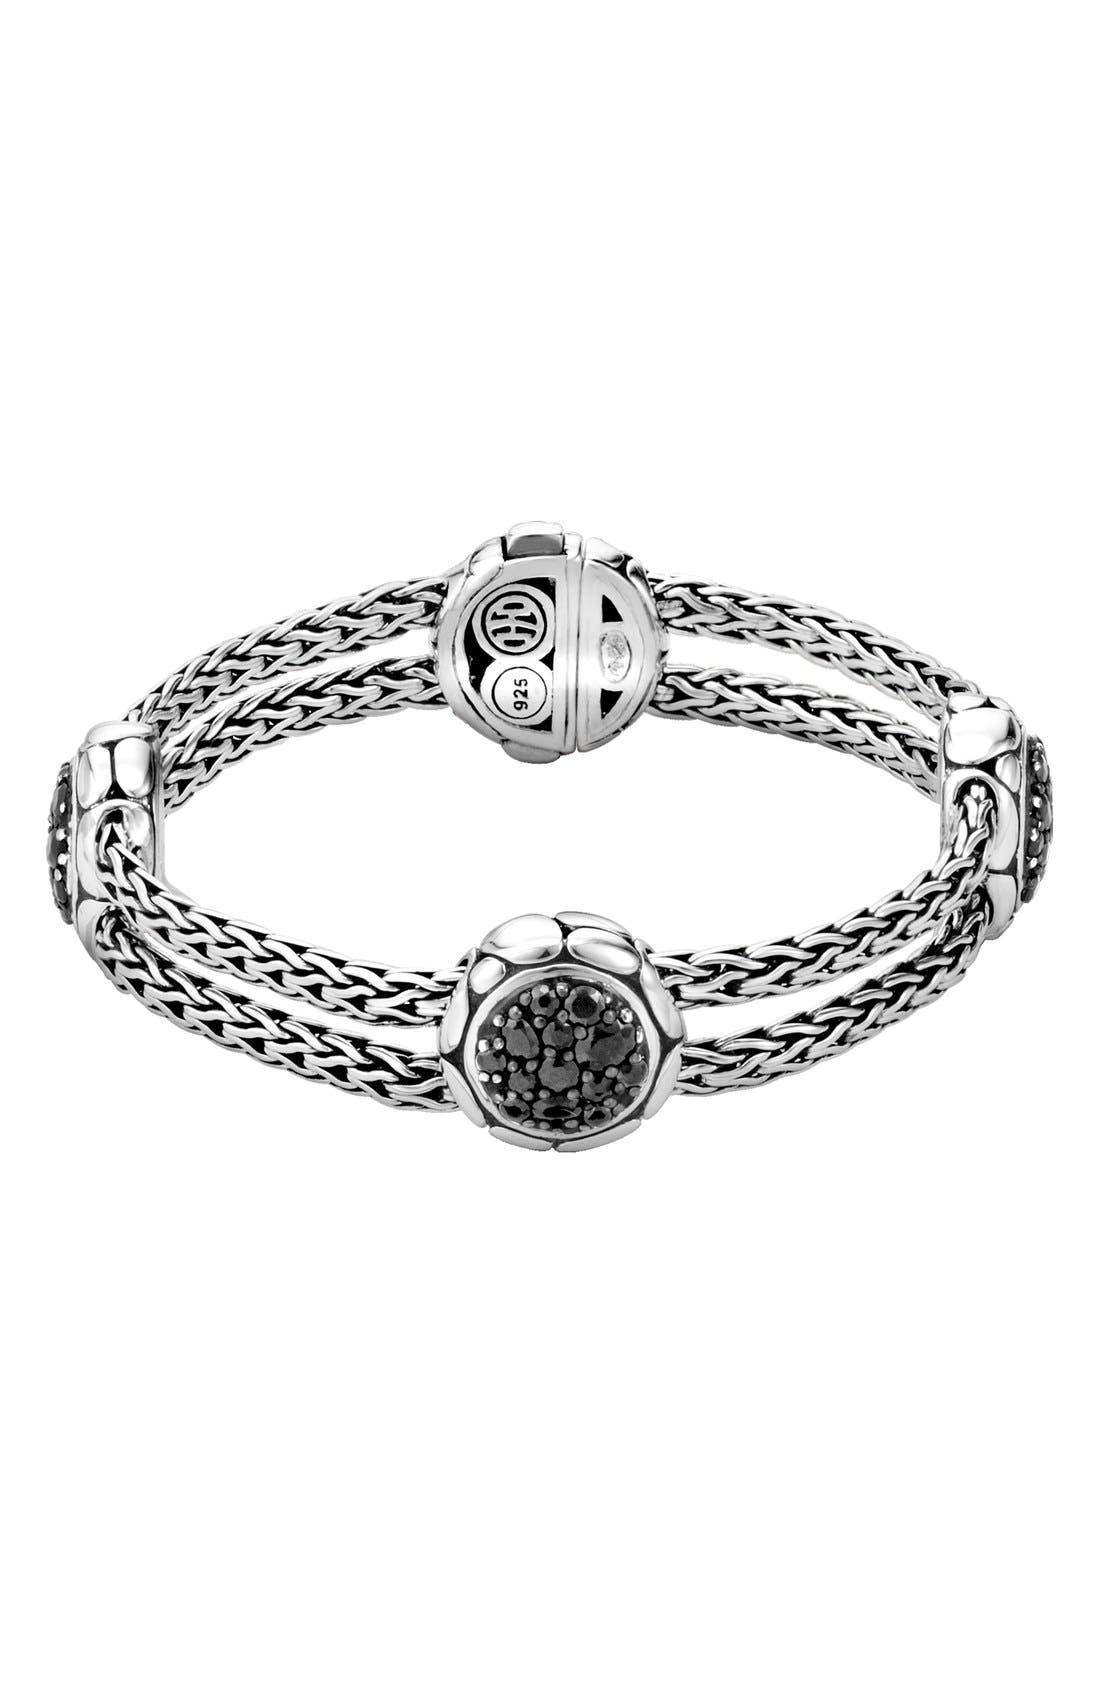 'Kali' Black Sapphire Bracelet,                             Main thumbnail 1, color,                             Silver/ Black Sapphire